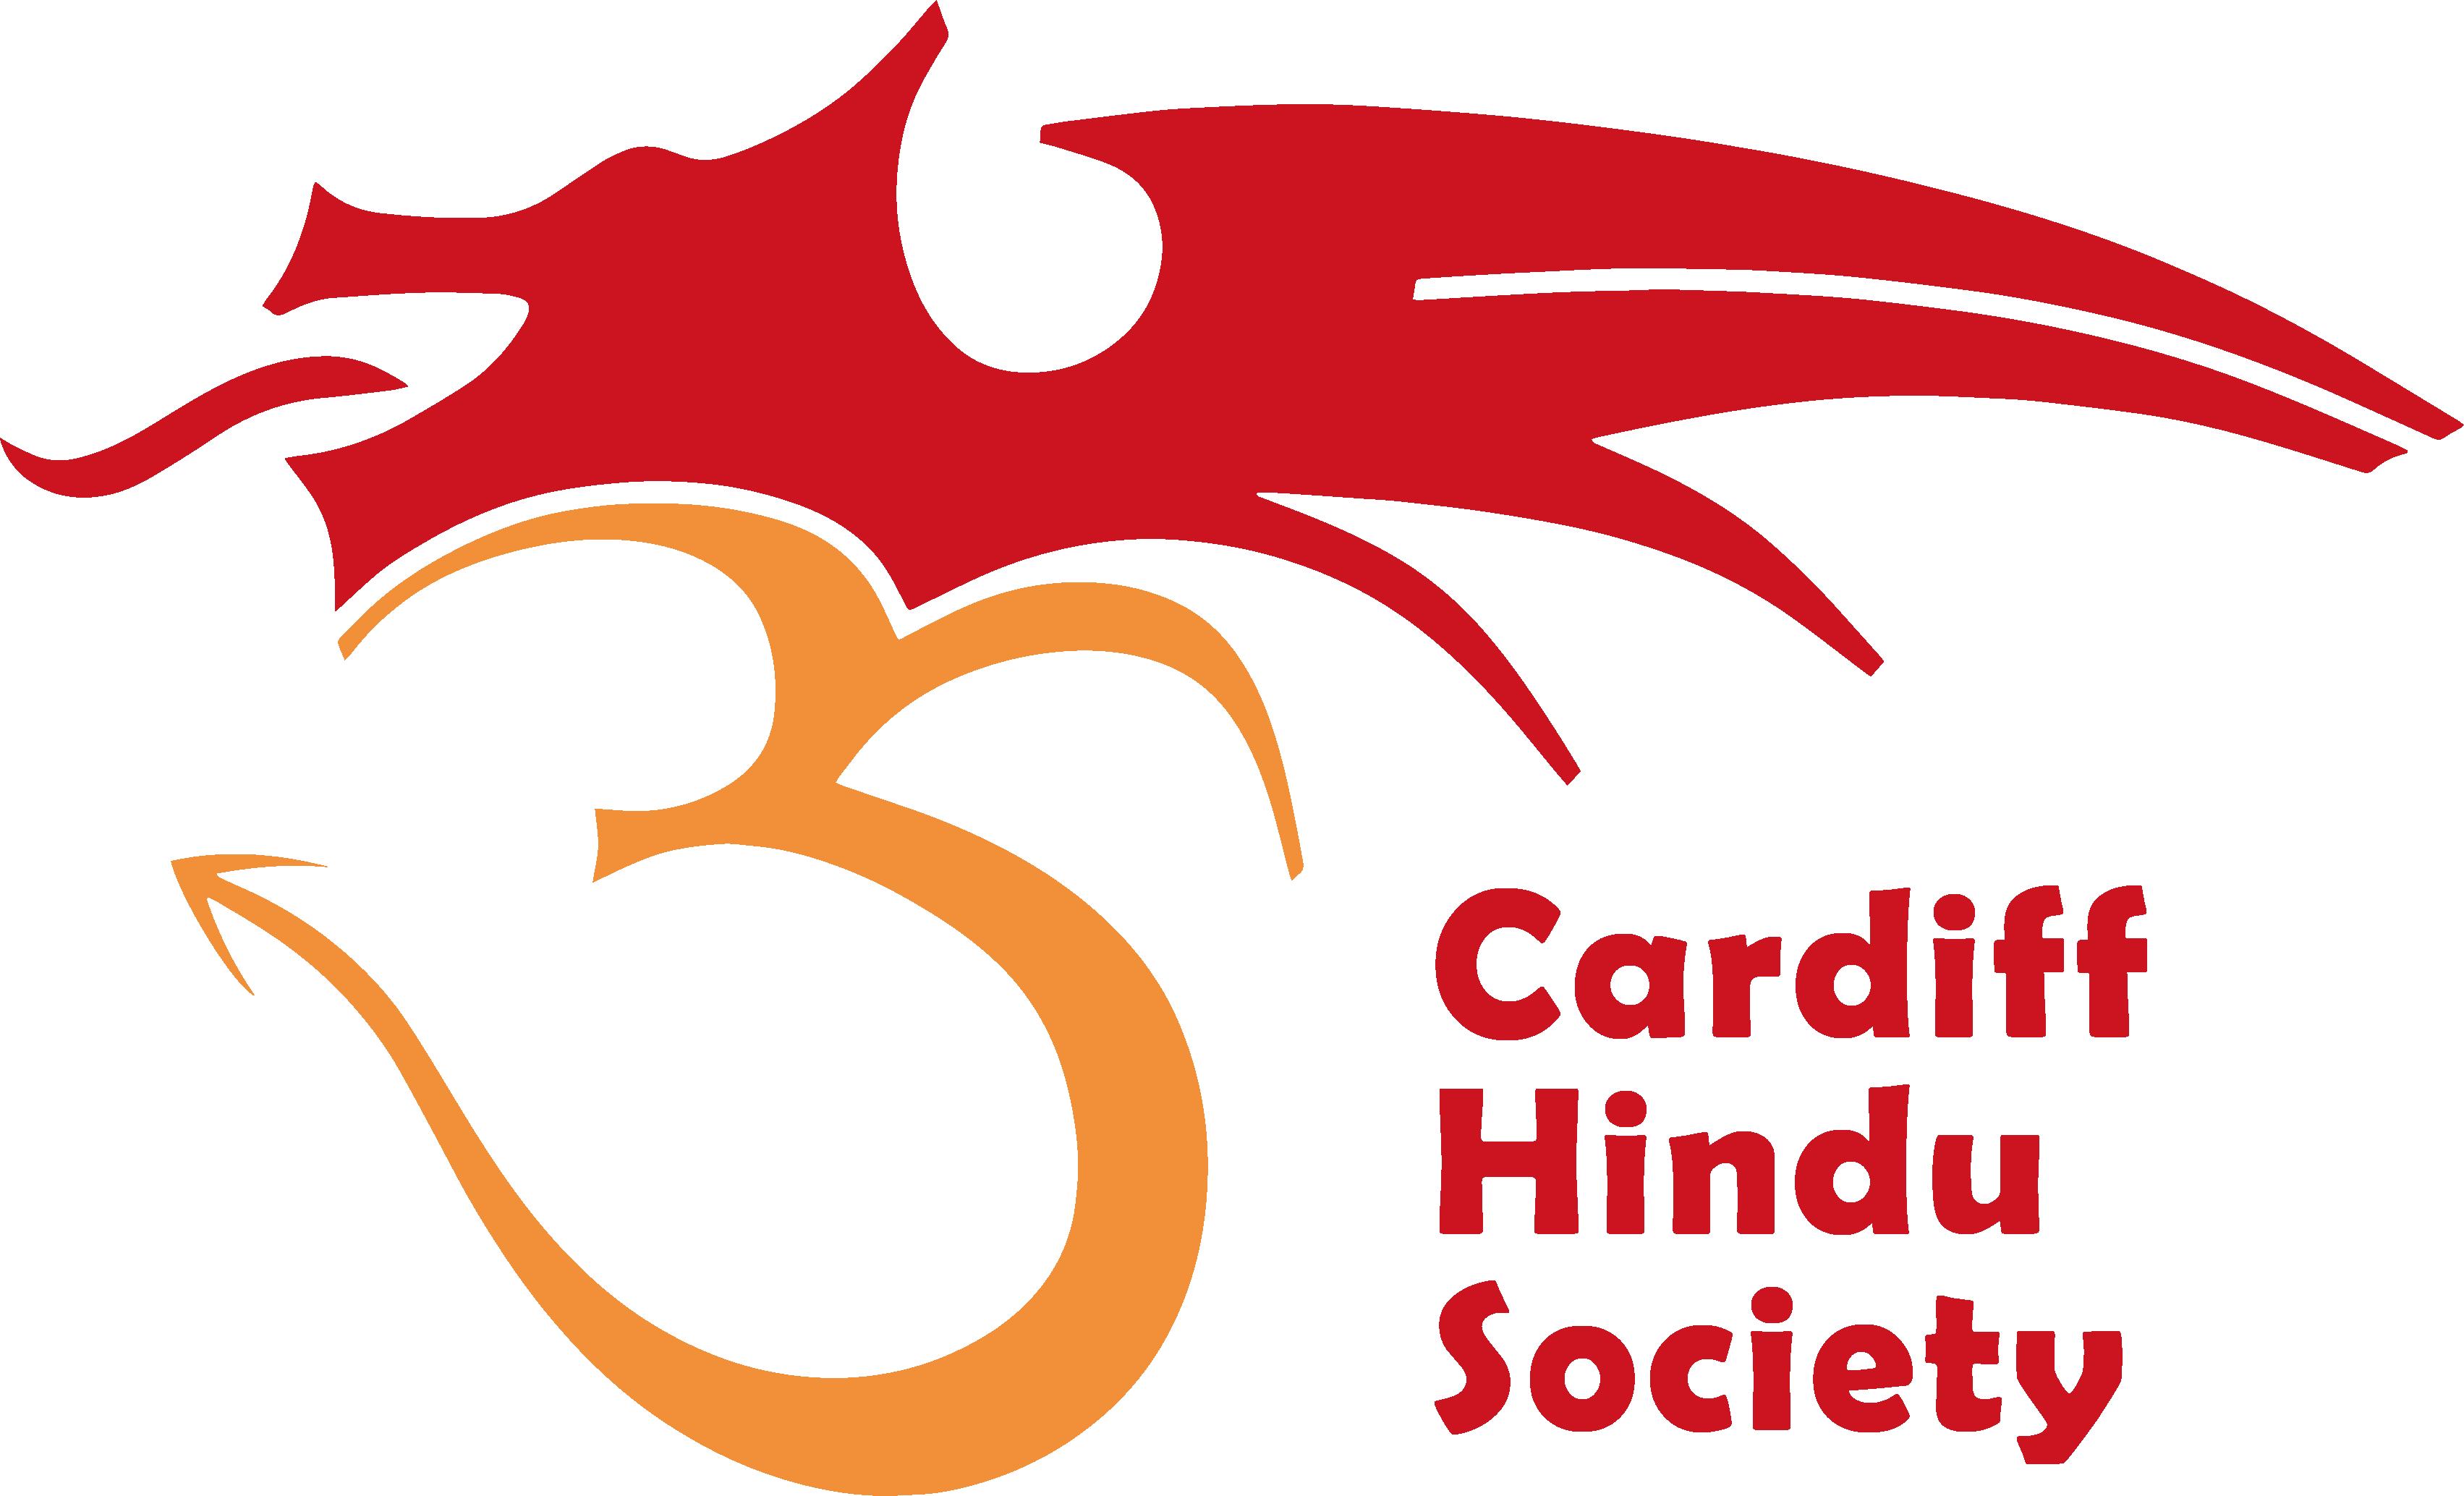 Cardiff Hindu Society